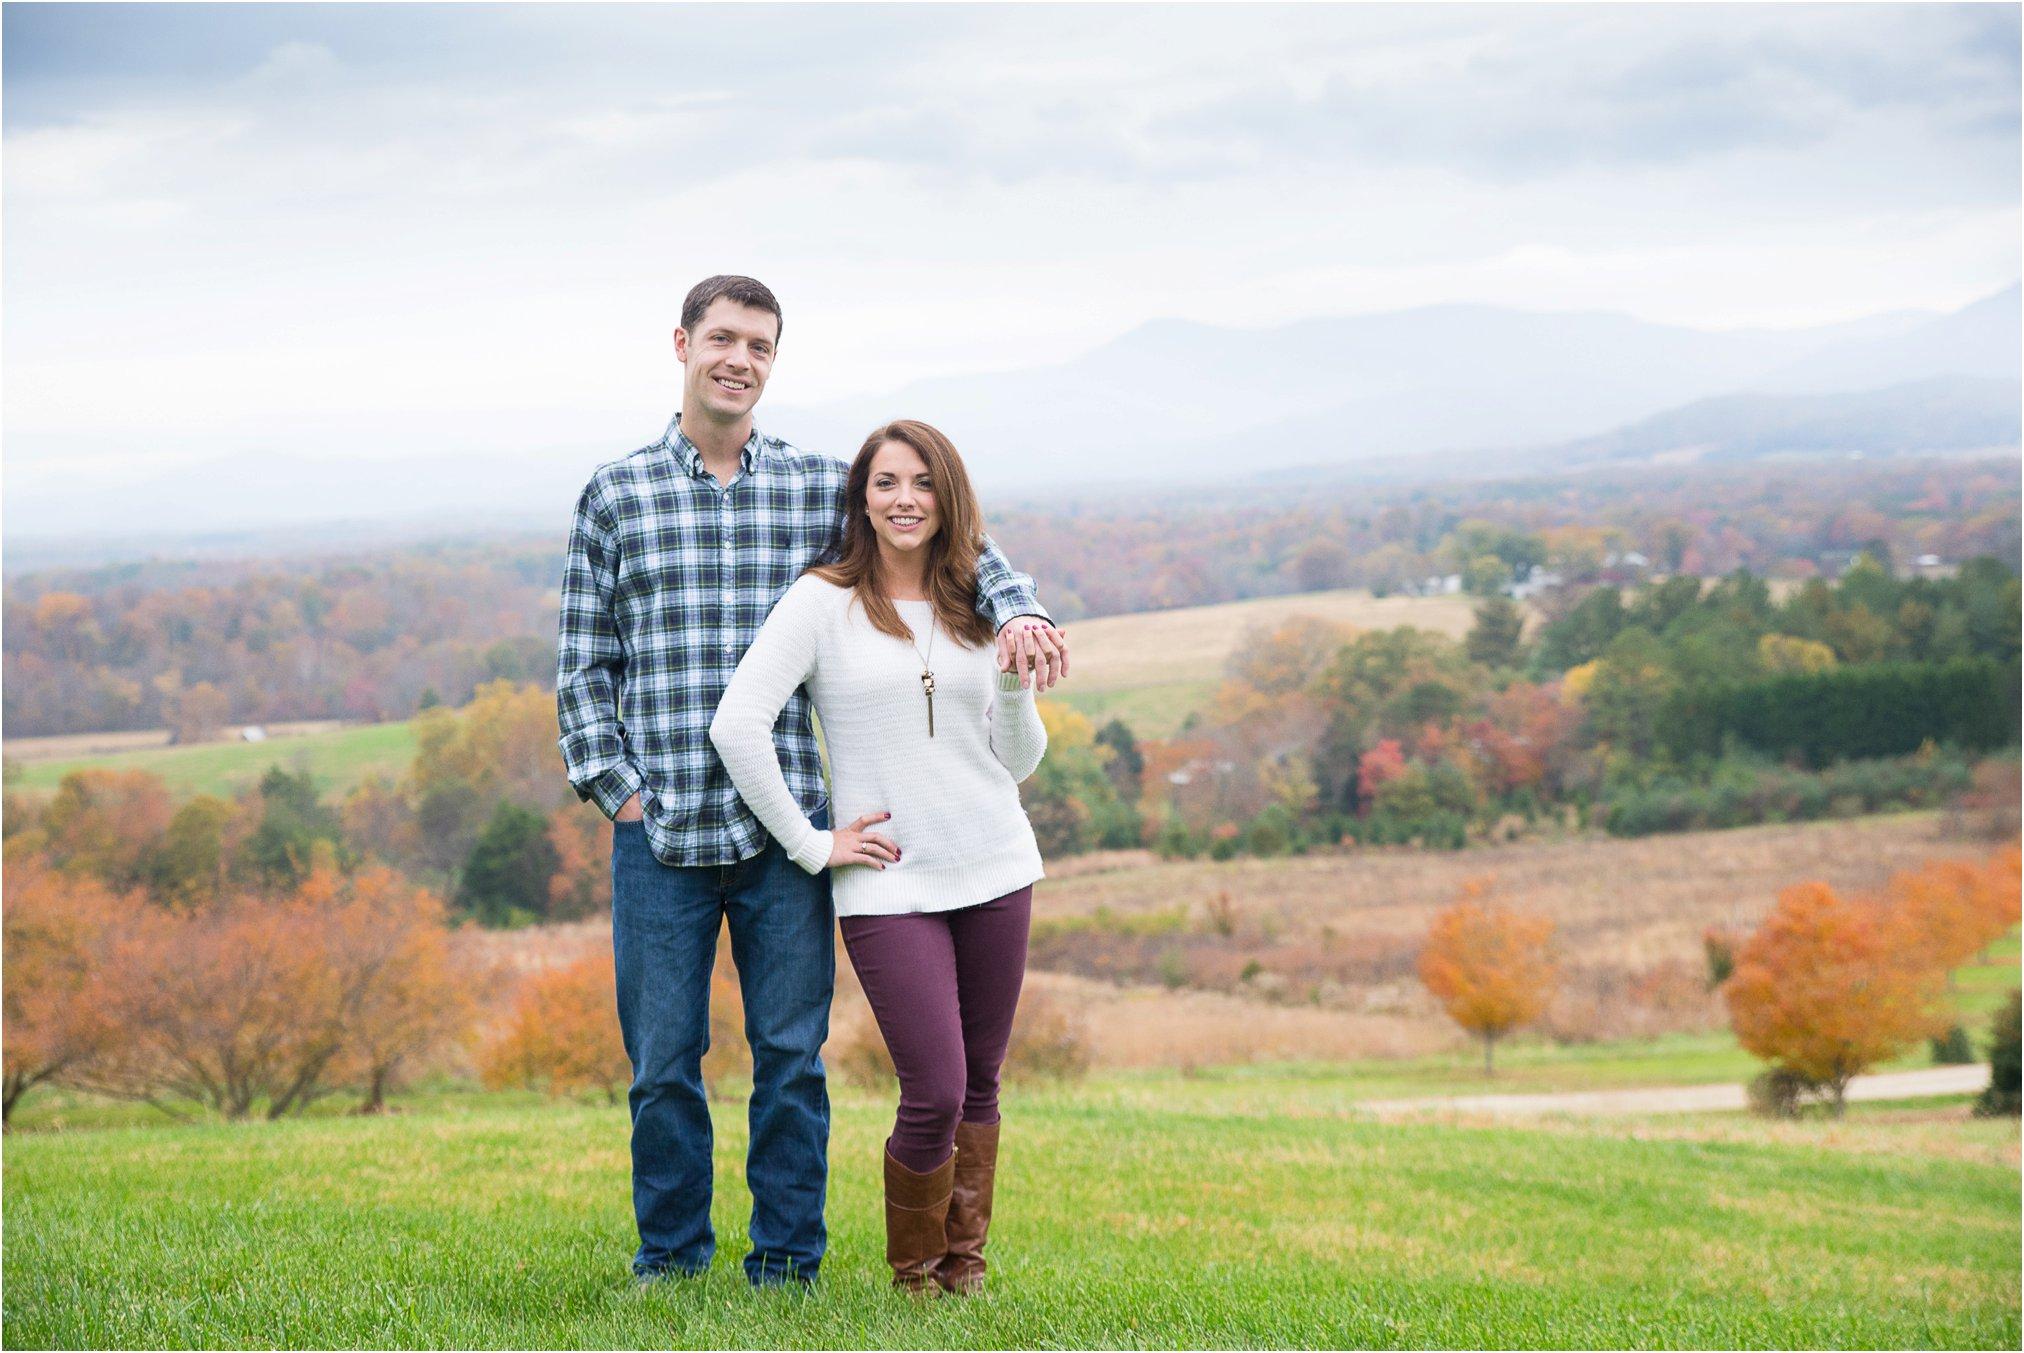 Nelson County Engagement-1-10.jpg